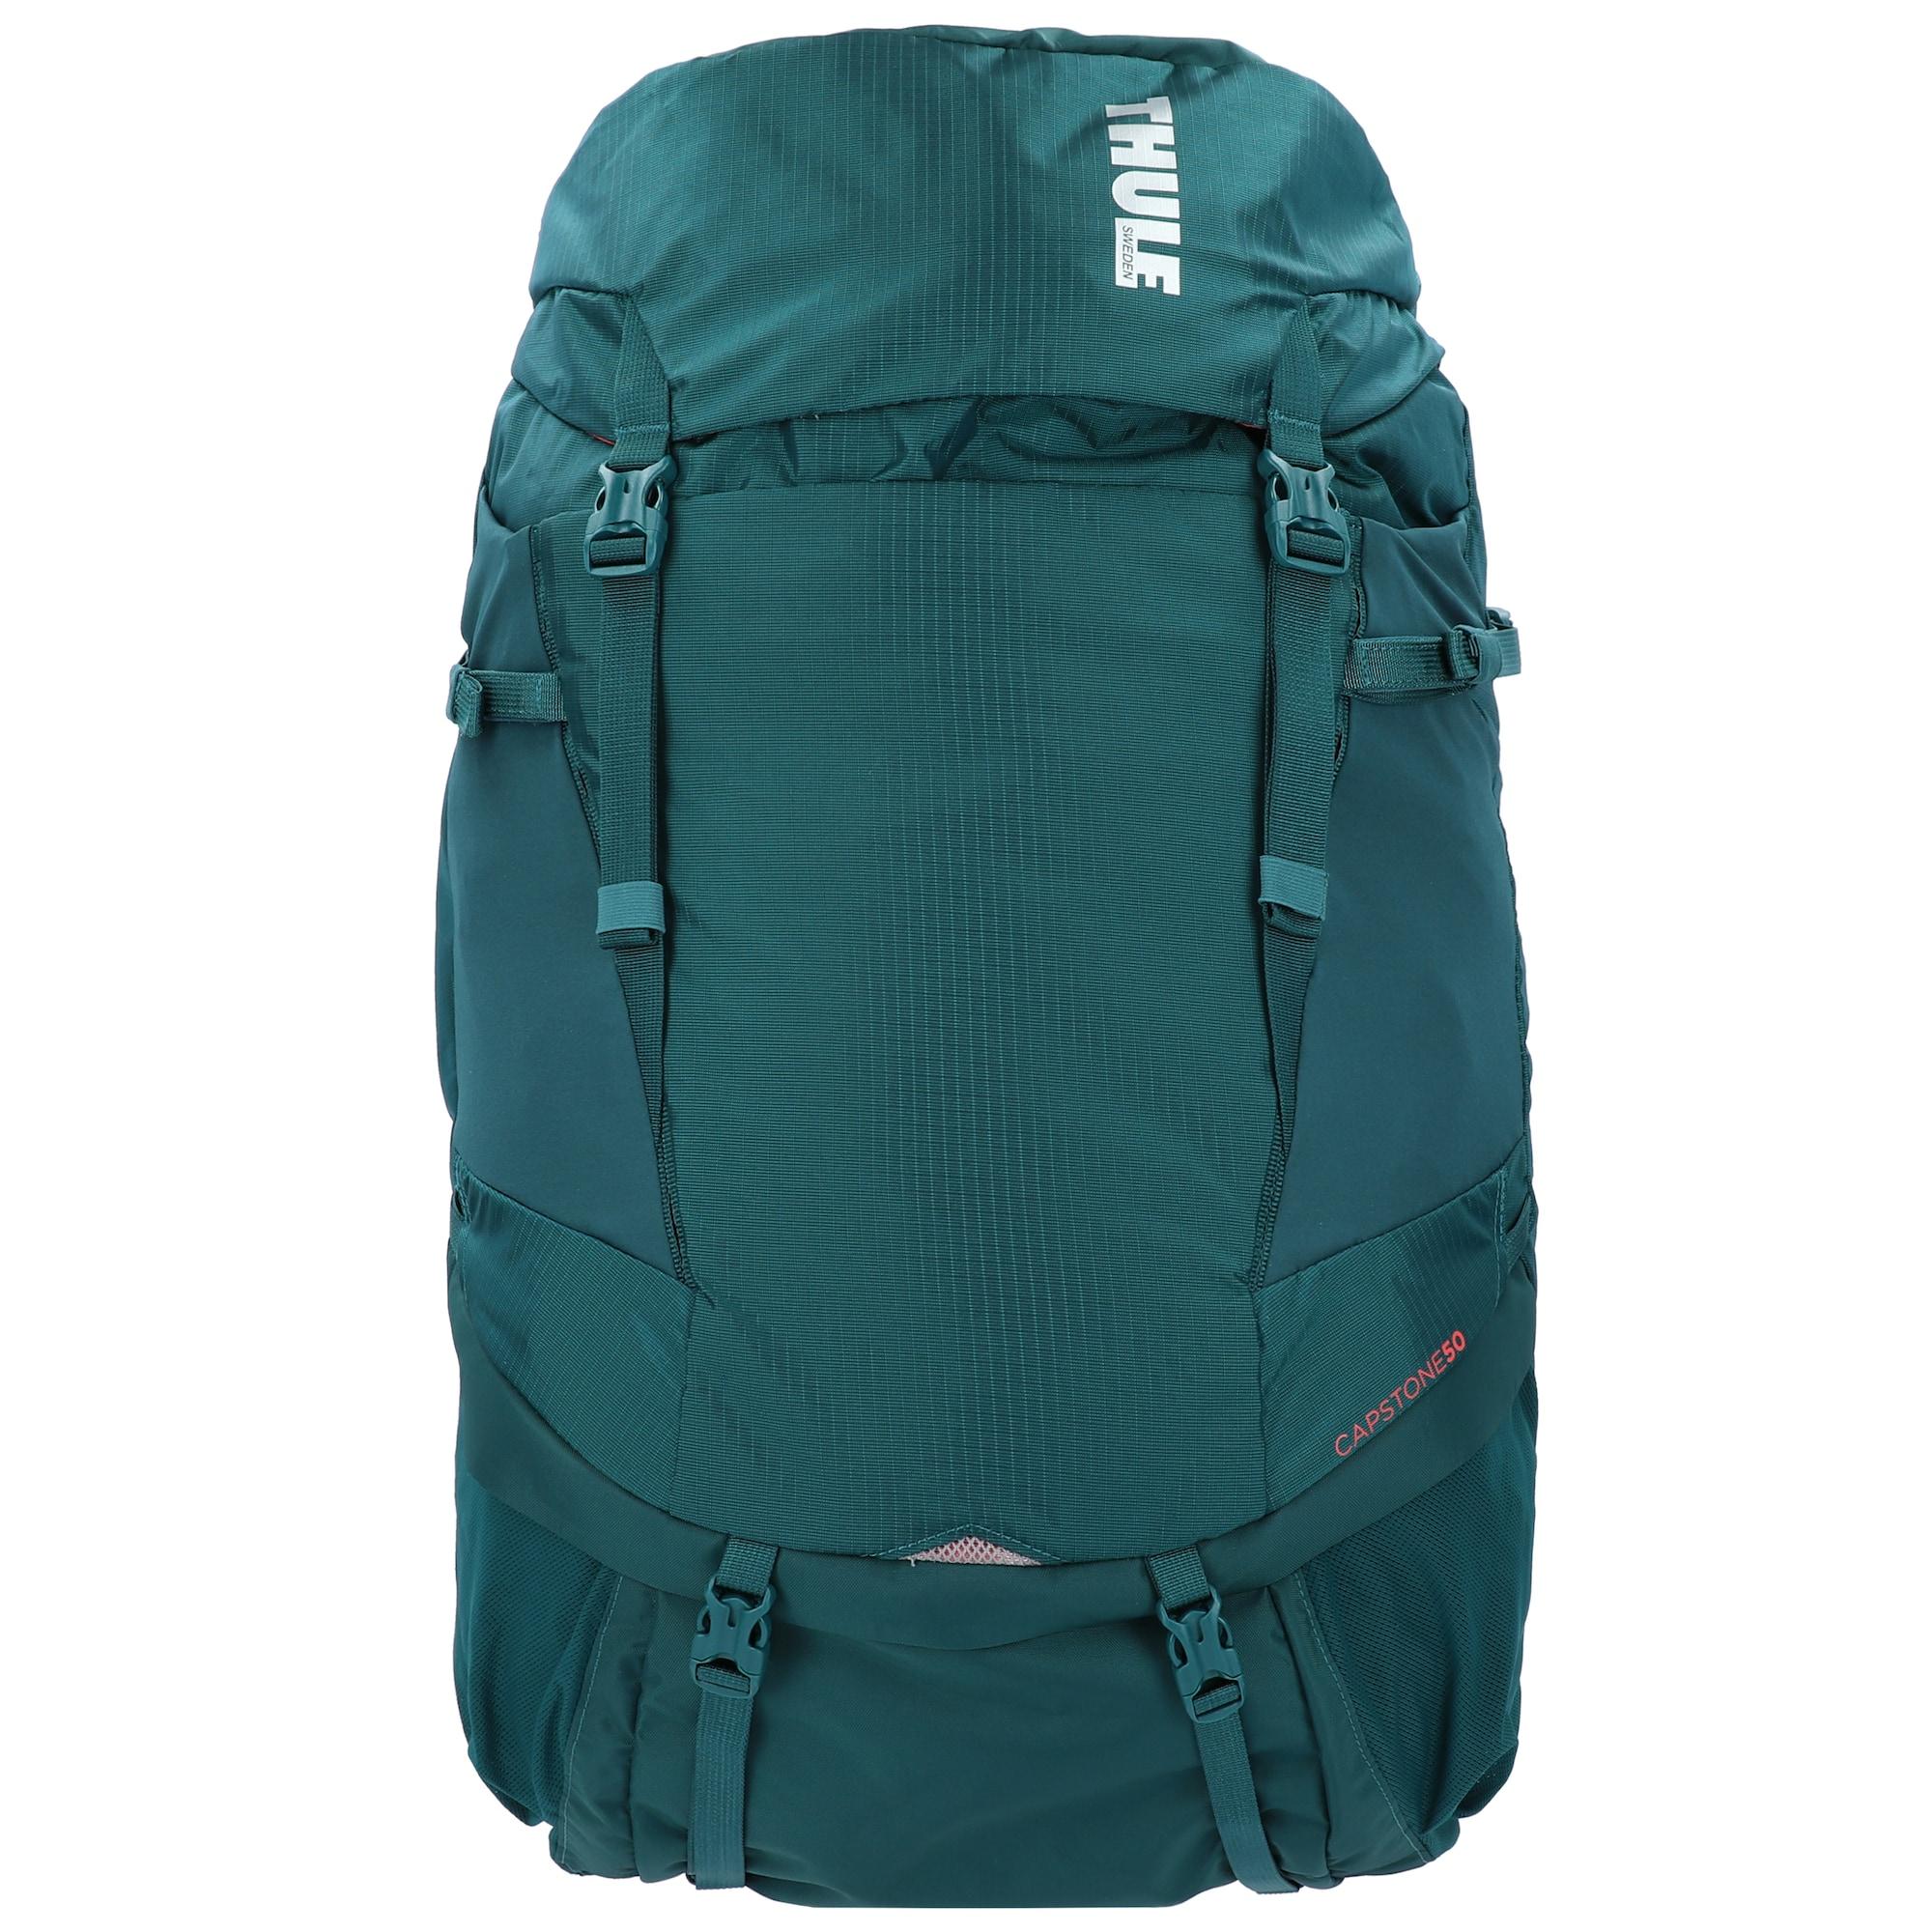 Rucksack | Taschen > Rucksäcke > Sonstige Rucksäcke | Thule